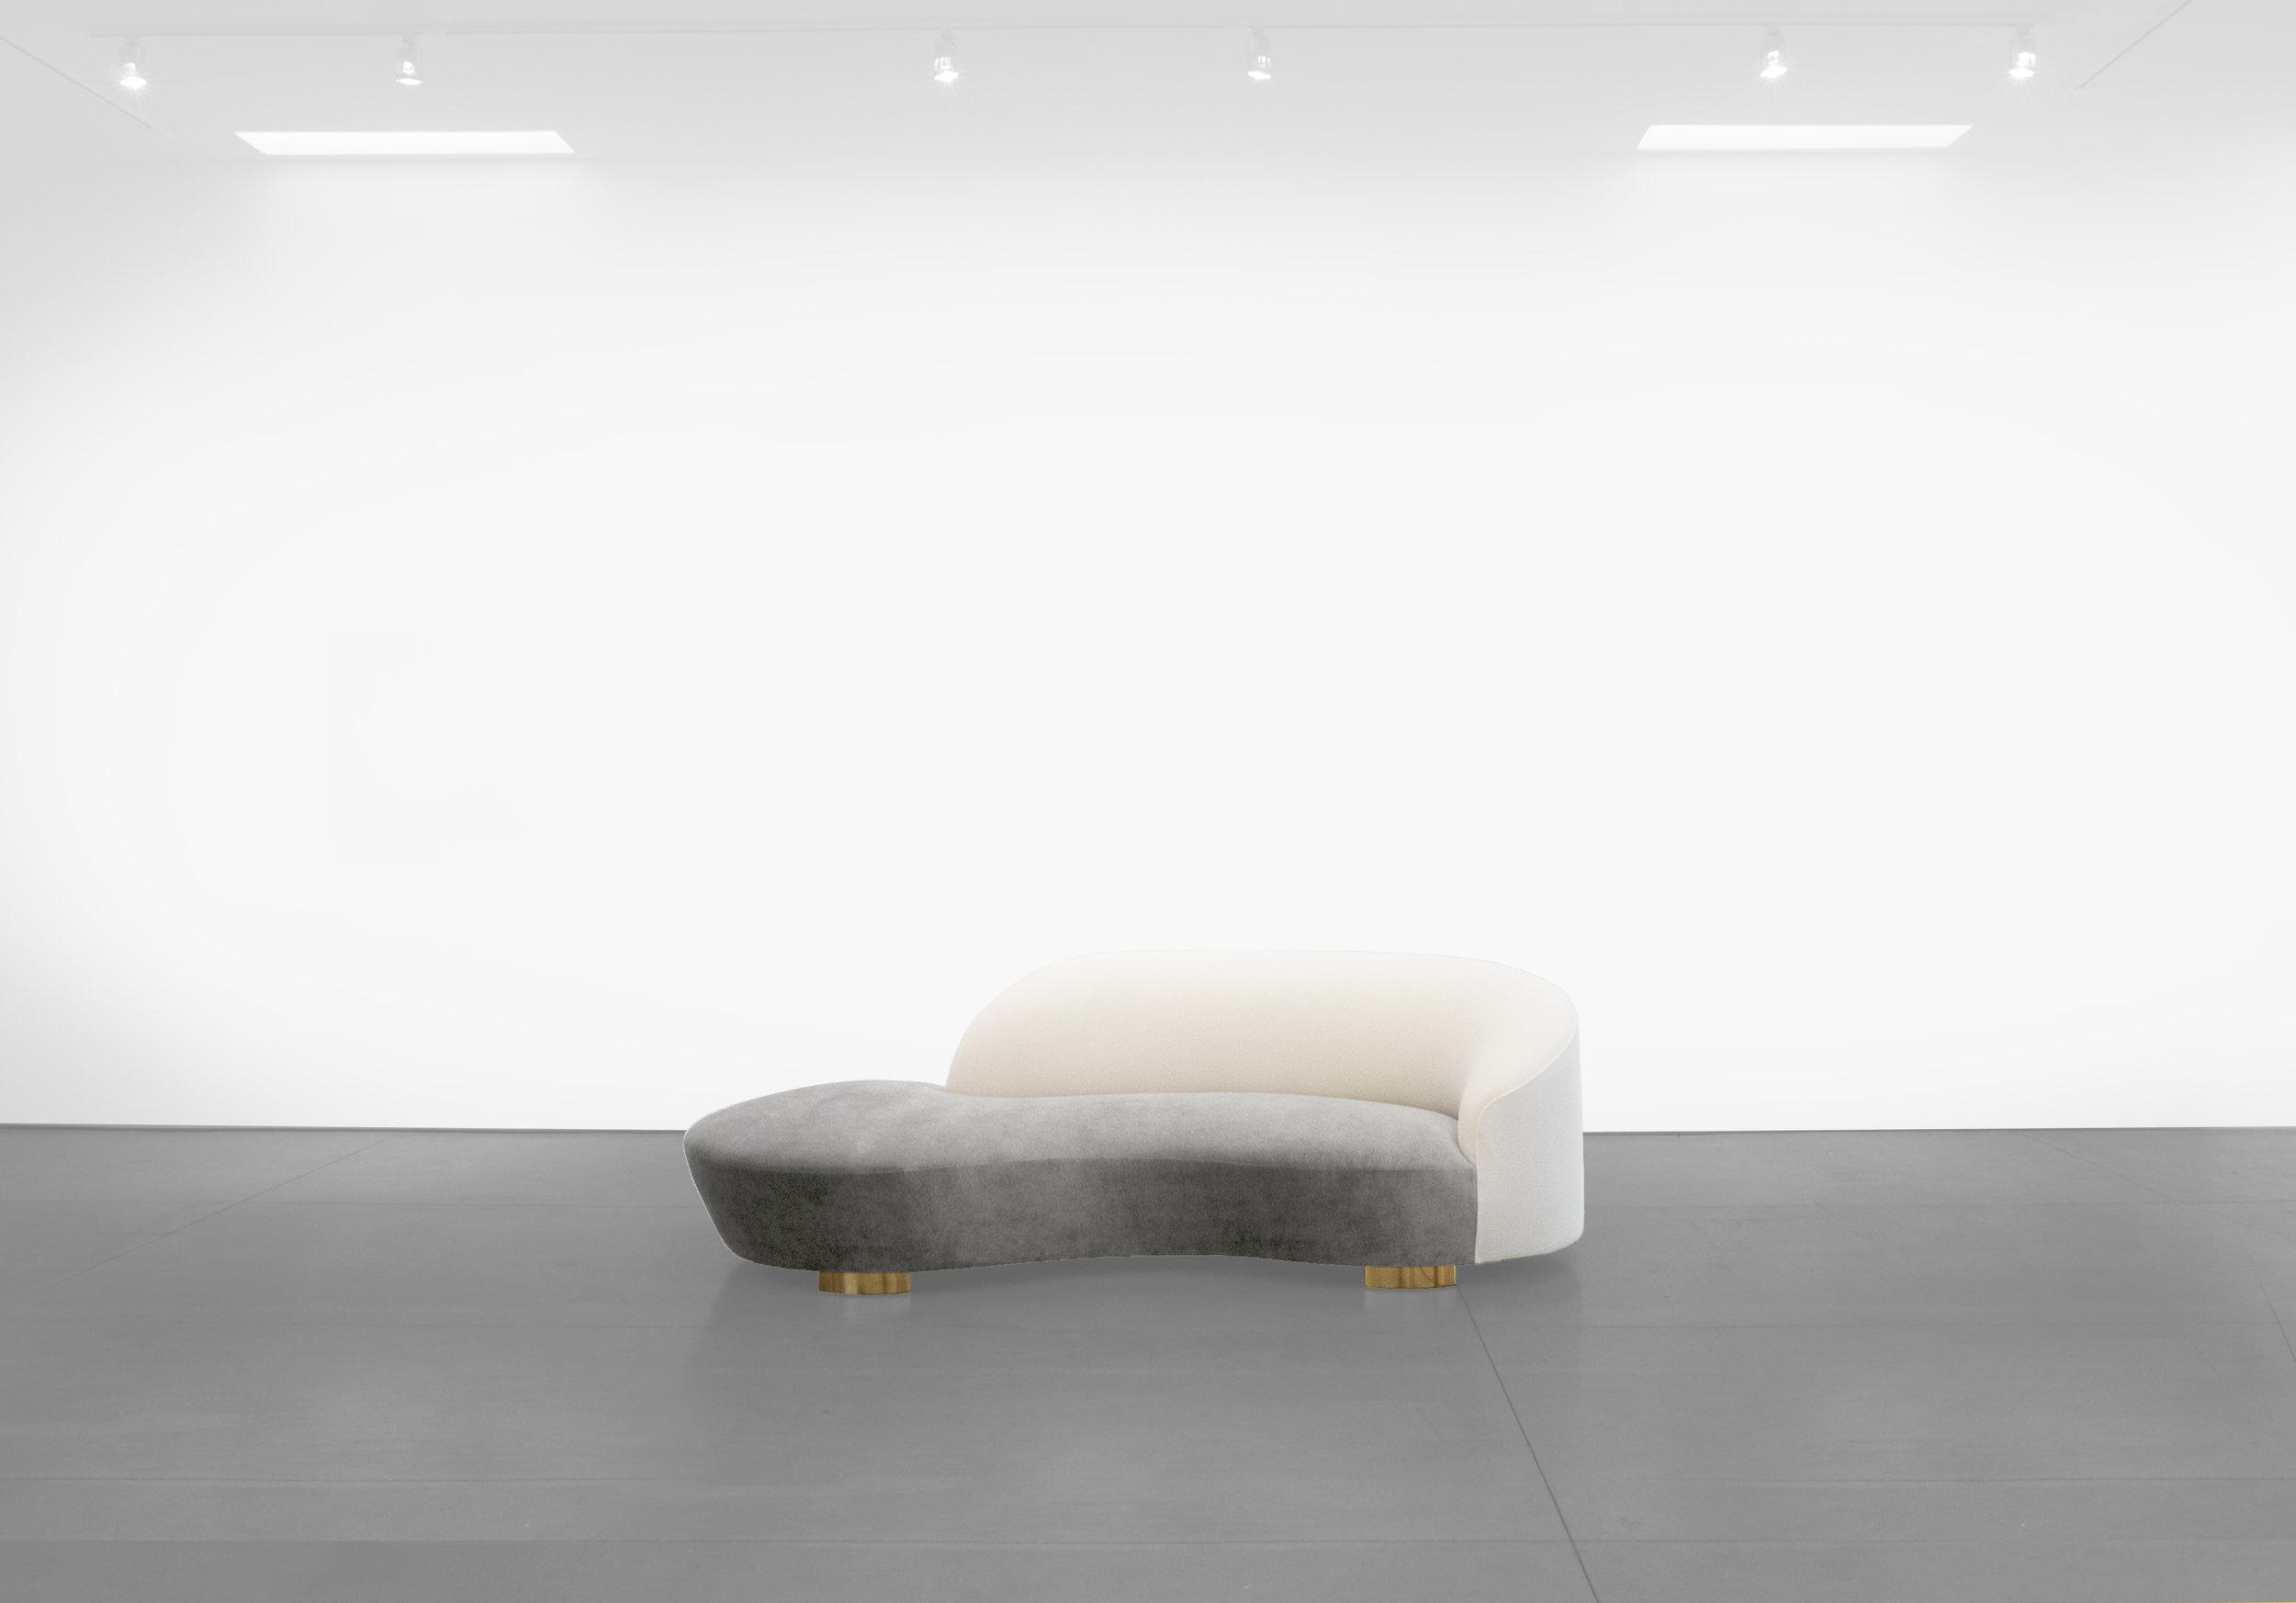 Vladimir Kagan, 'Cloud' Sofa, c. 1970 - 1979, Wood, Dedar Milano Upholstery, 32.5 H x 98 W x 16 D incehs_1.jpg